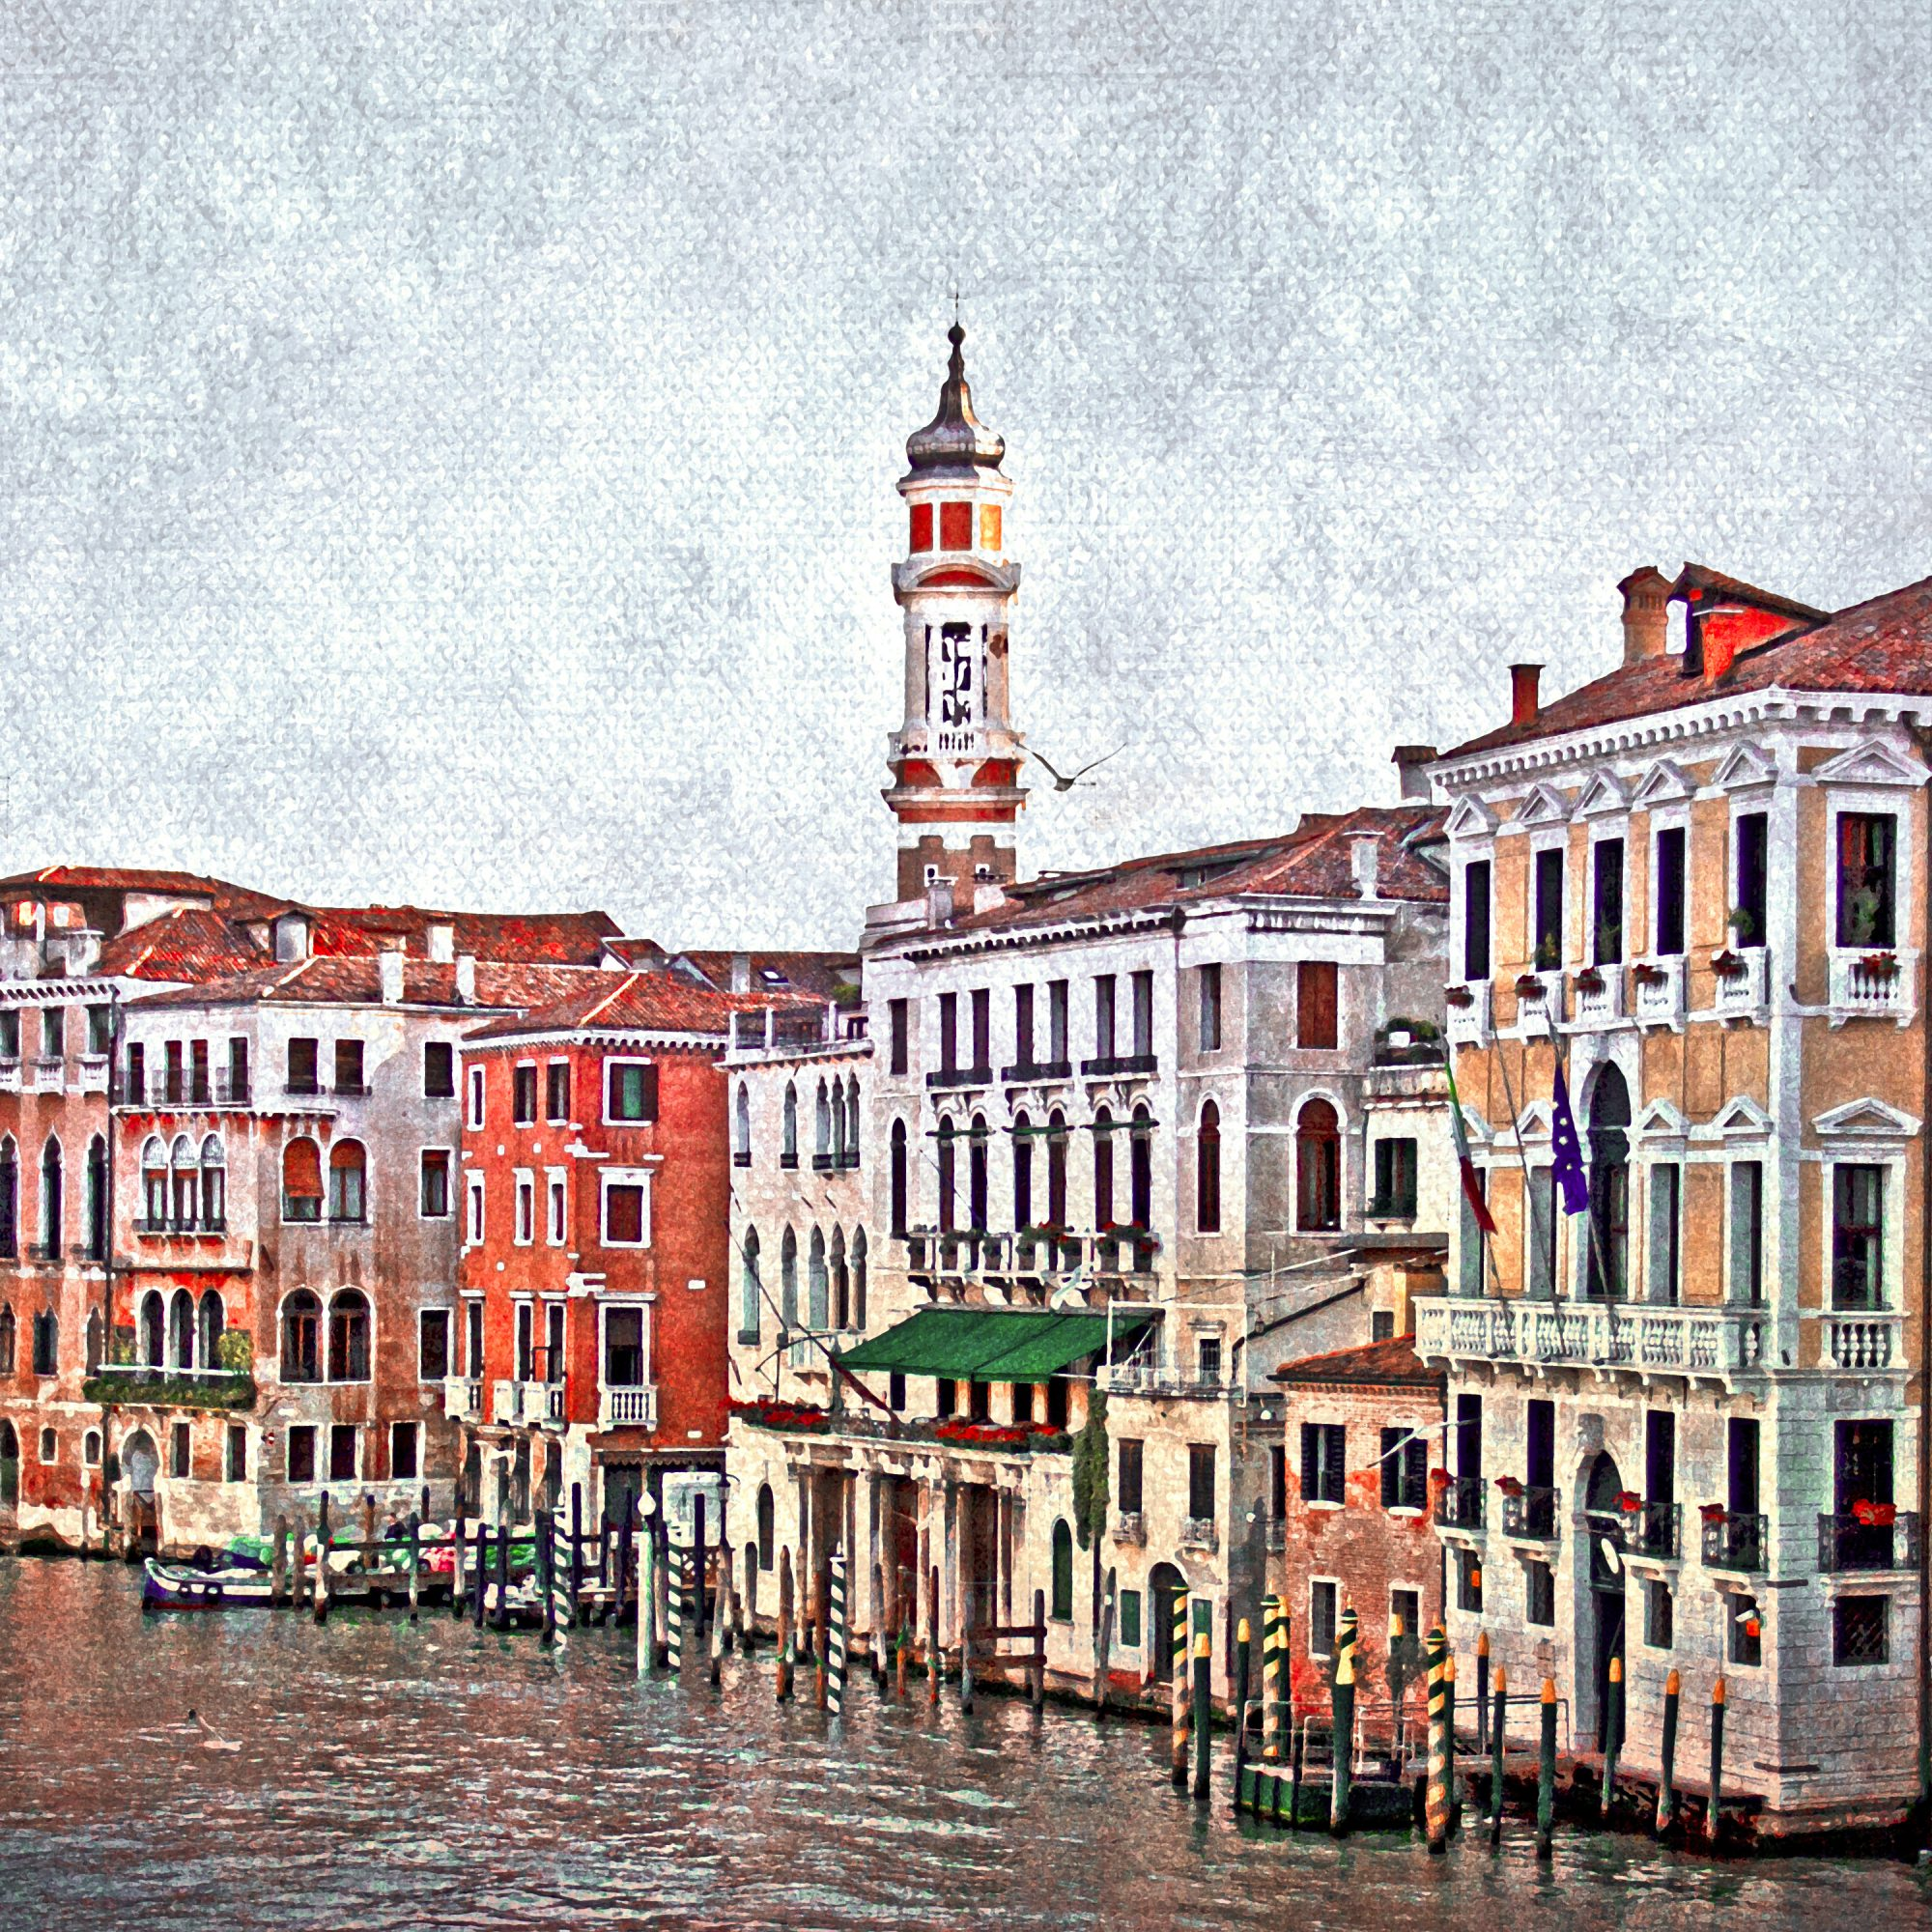 pcf1281sq-venetian-landscape-reduced